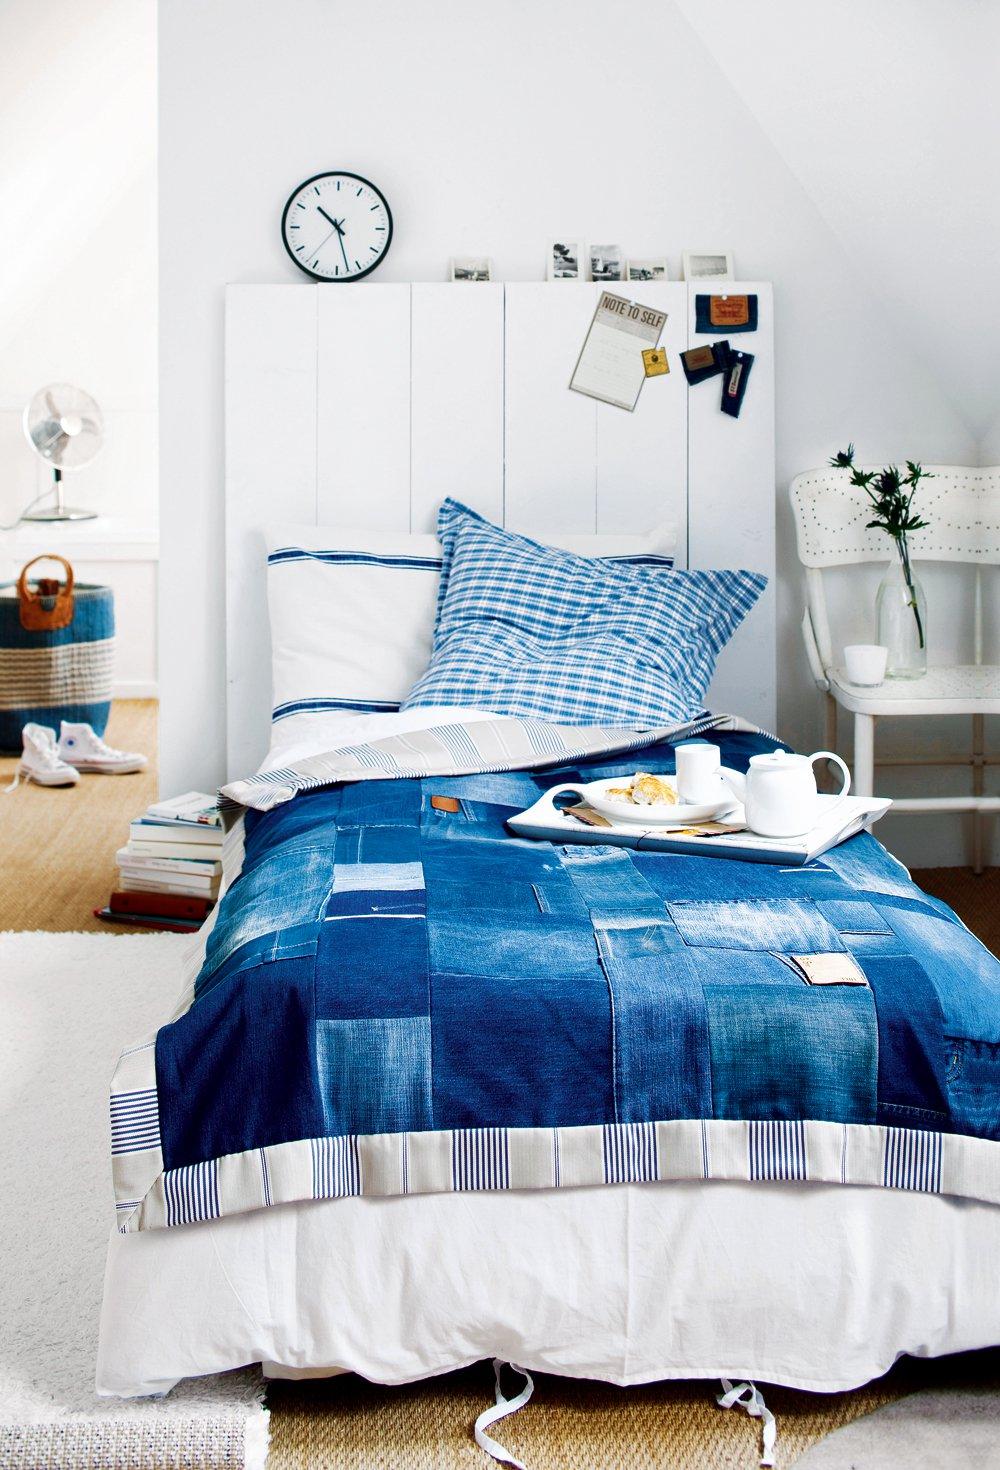 r cup et fait maison des id es r cup et d co cr ations en jean id e r cup avec un vieux jean. Black Bedroom Furniture Sets. Home Design Ideas